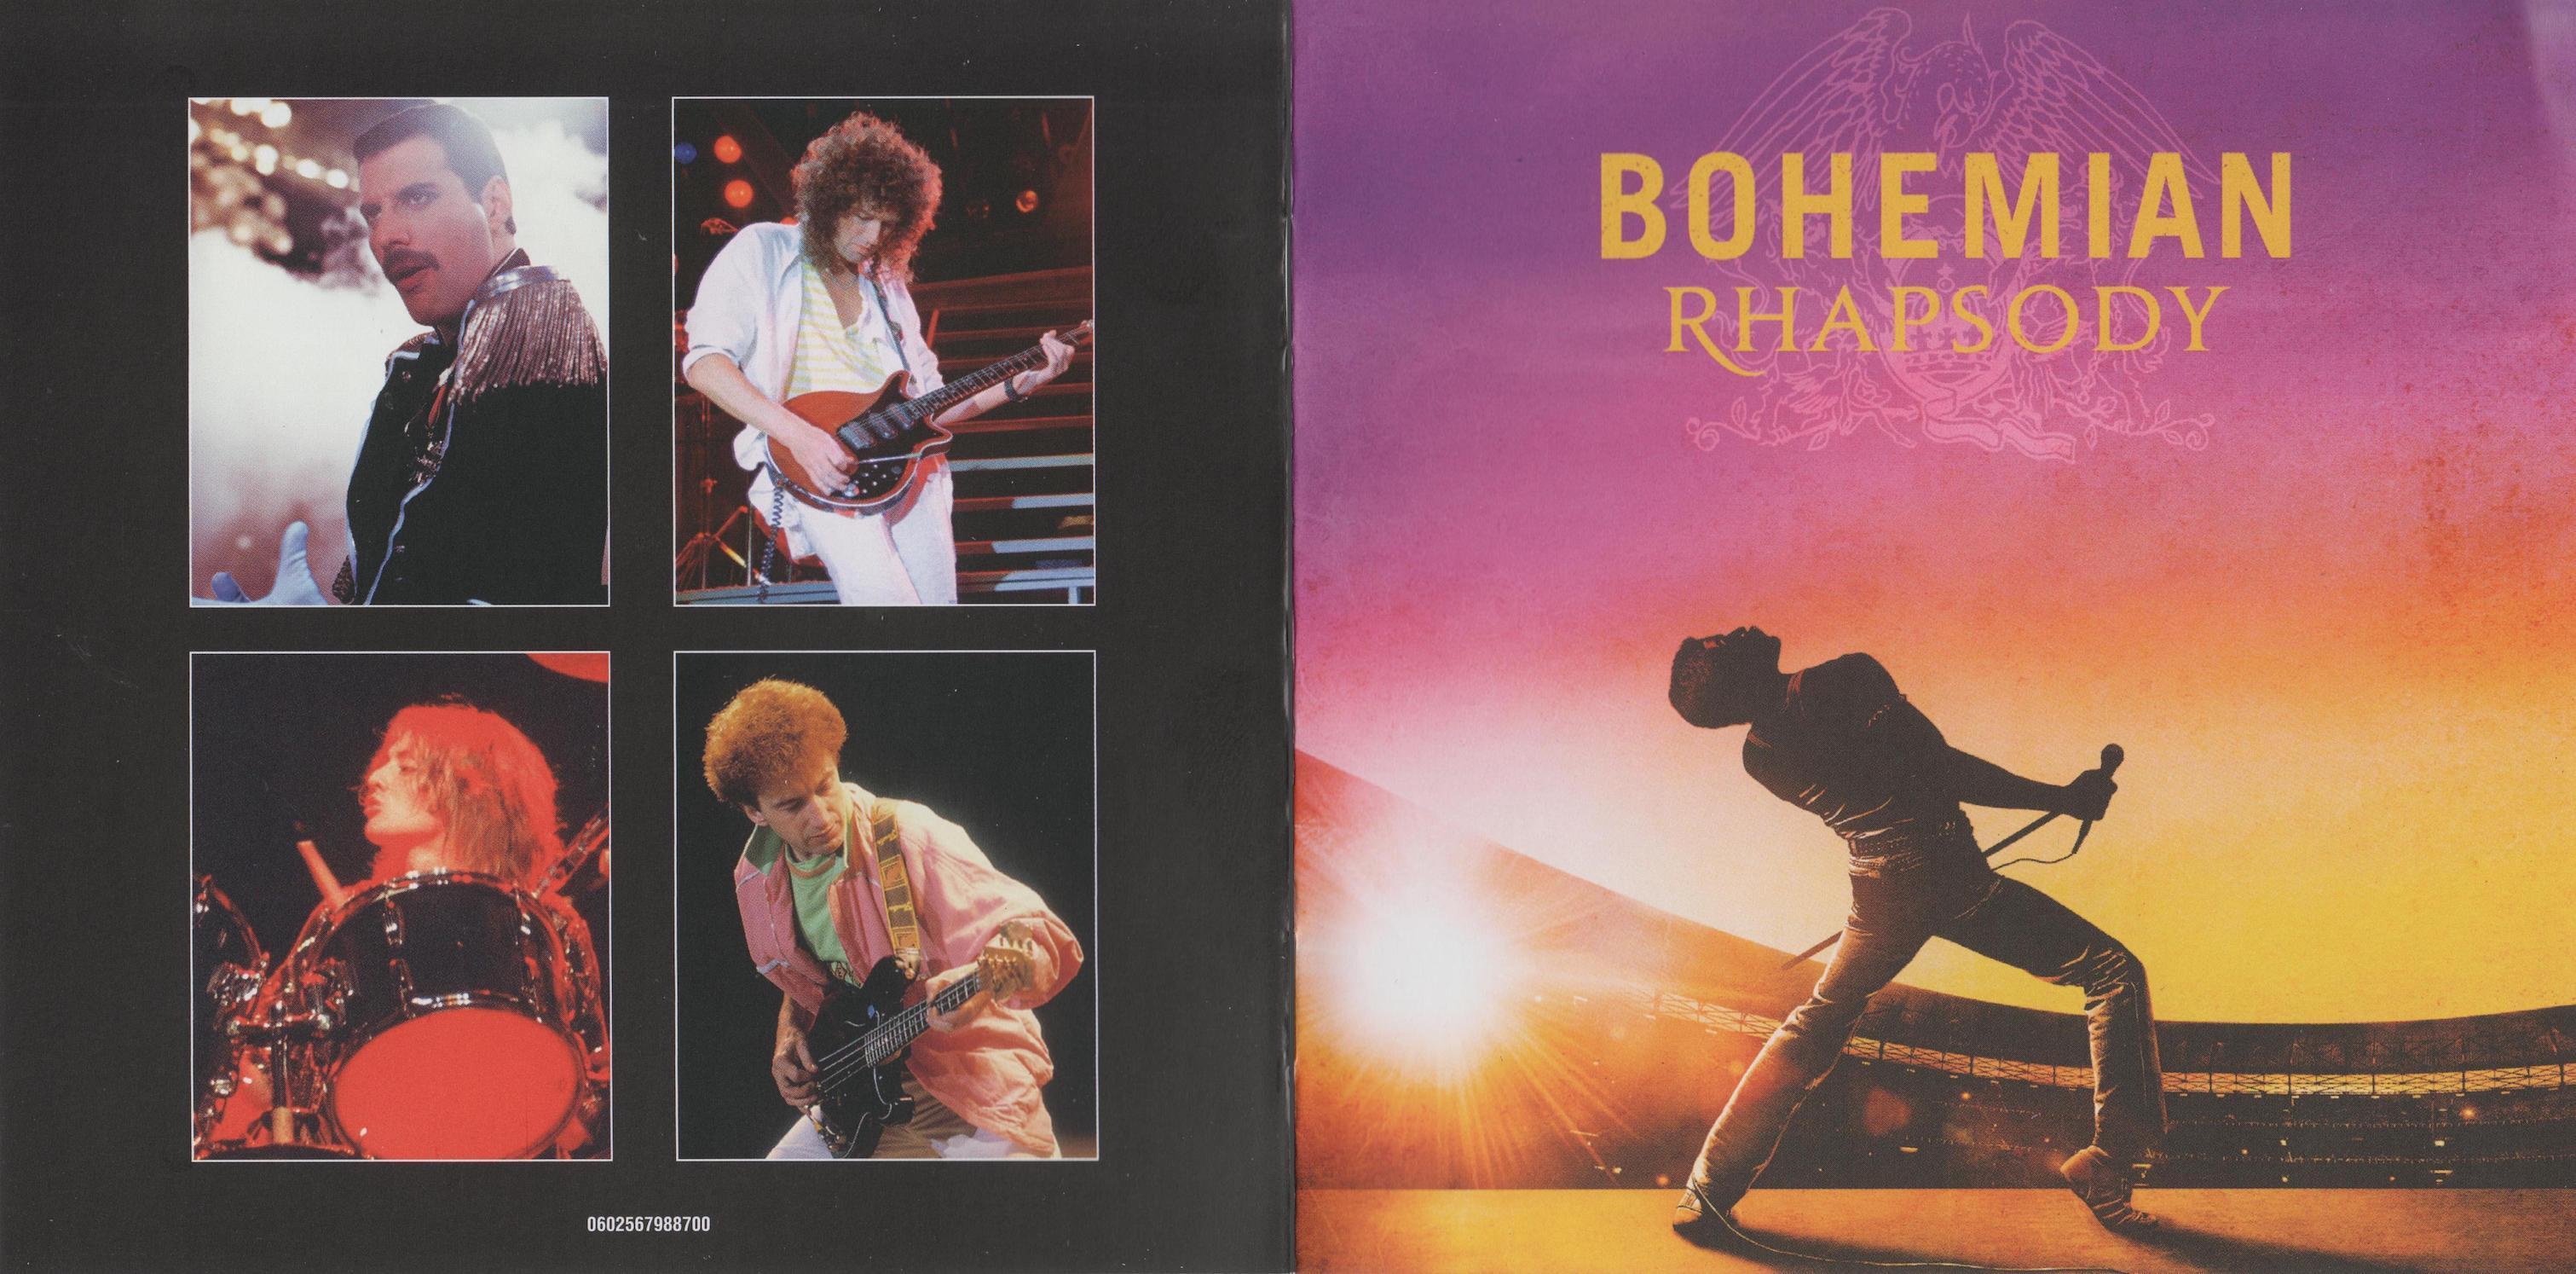 Bohemian Rhapsody 2018 Dvd Label